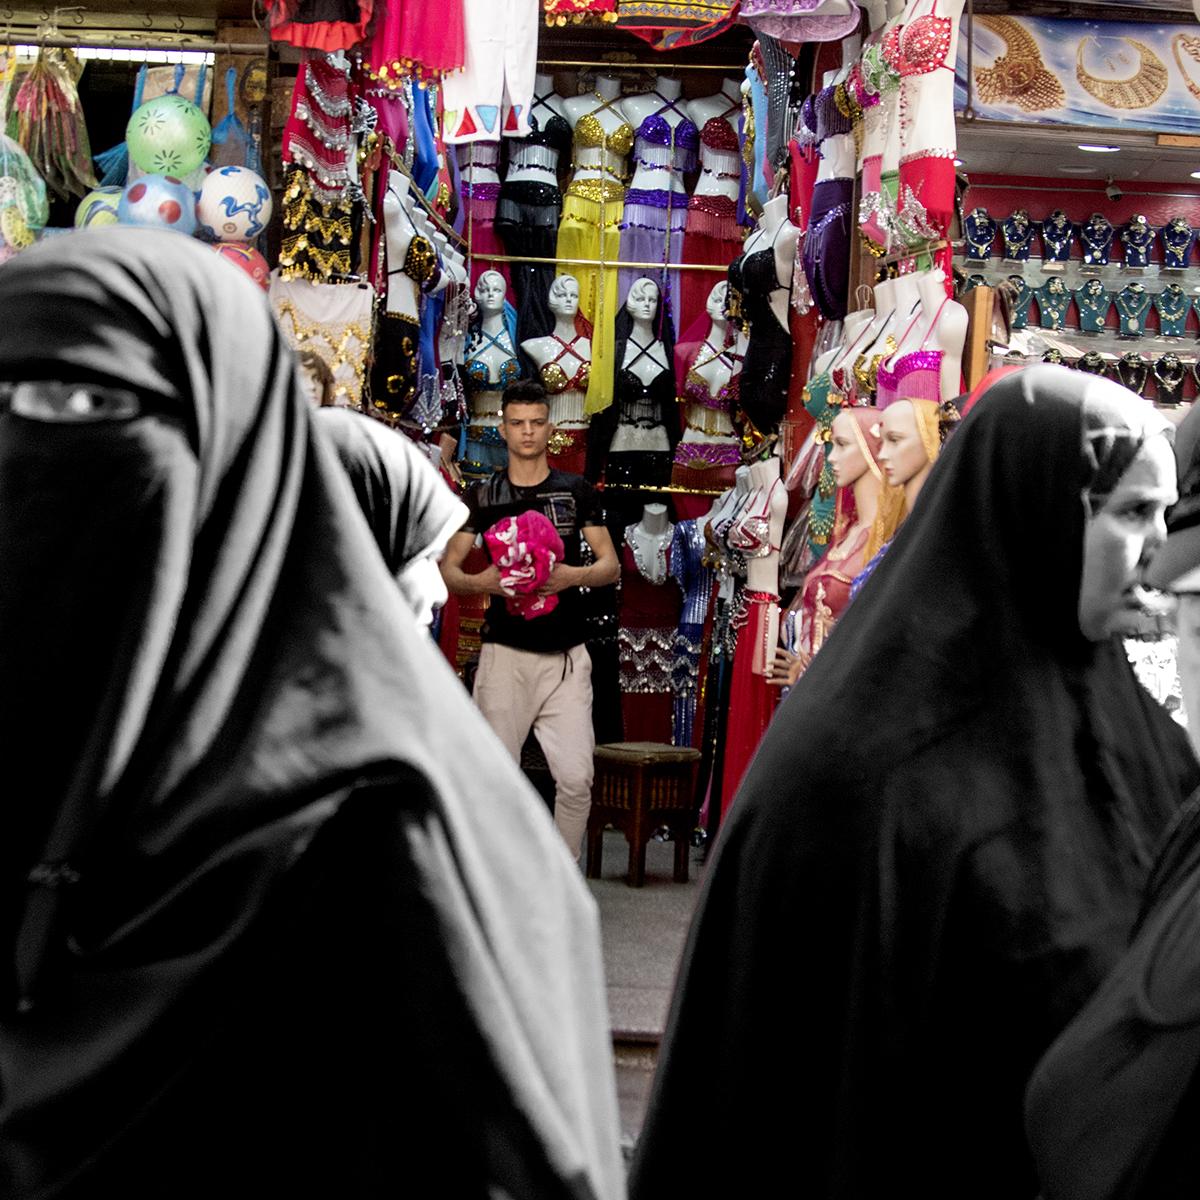 Conservative Muslim women pass by a lingerie shop in the Khan Al-Khalili market, Cairo, Egypt